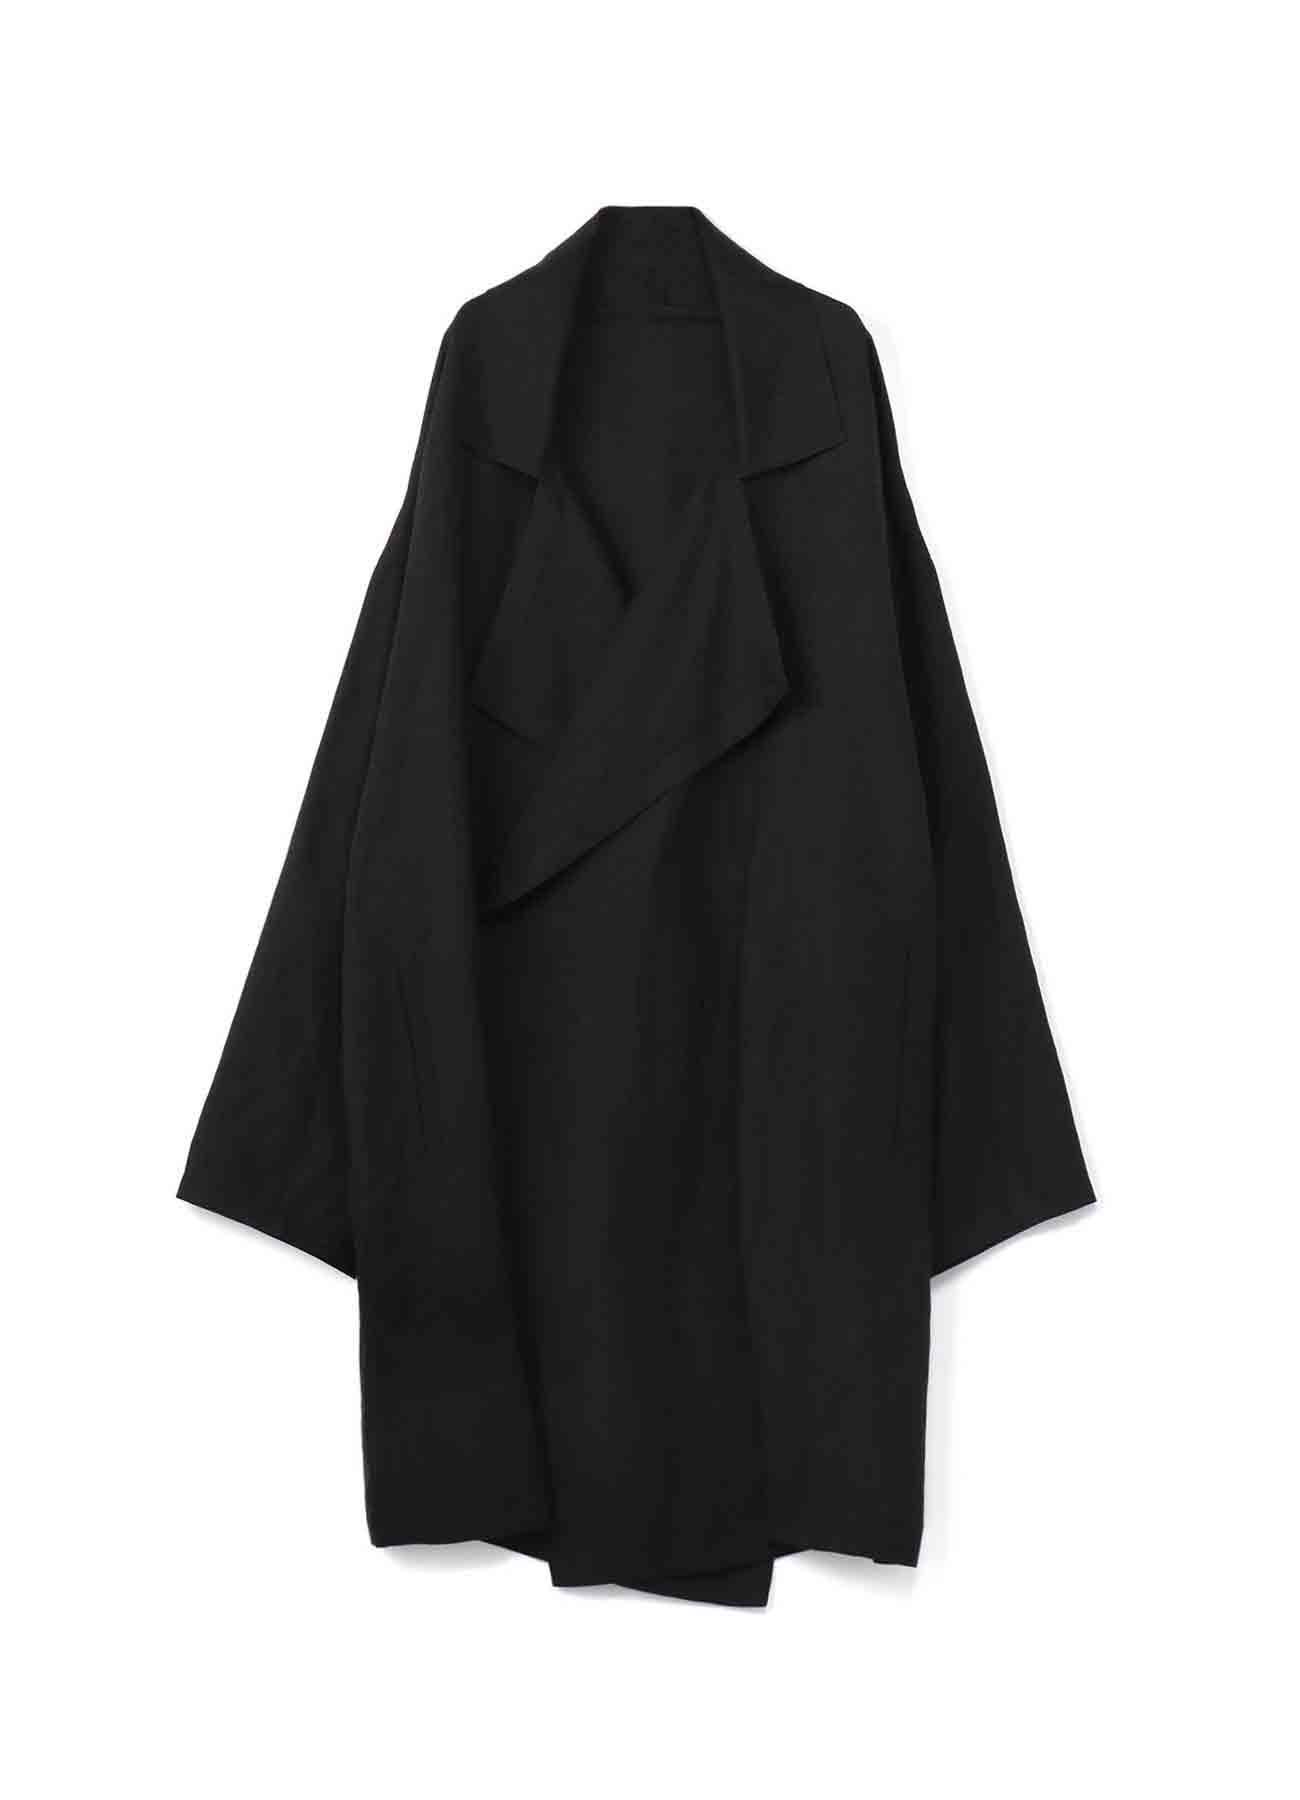 Linen Rayon Frame Double Collar Drape Coat